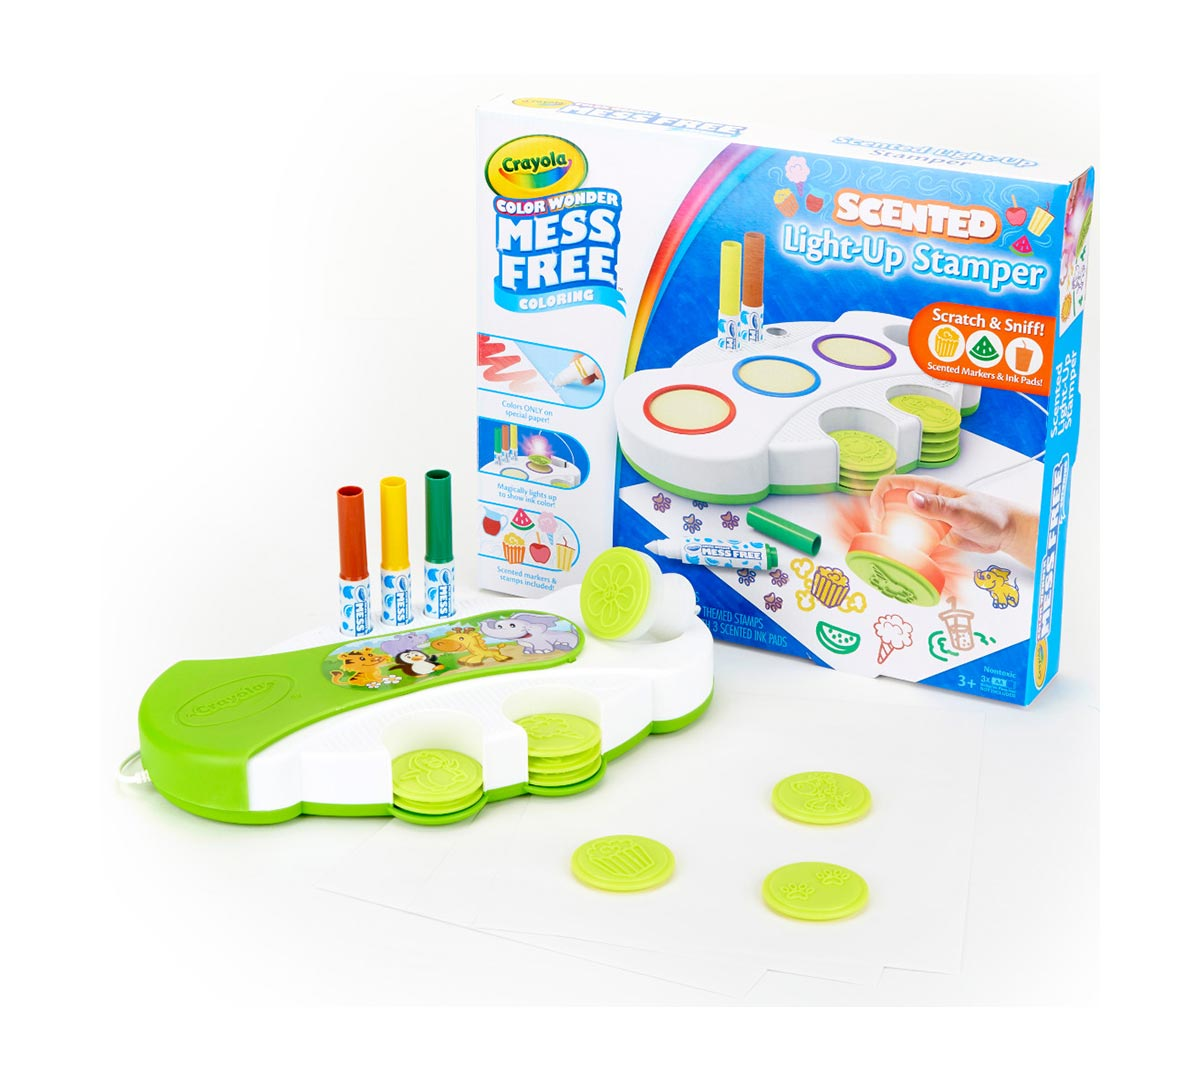 New Crayola Color Wonder Mess Free Light-Up Stamper Creative Set /& Pens Official